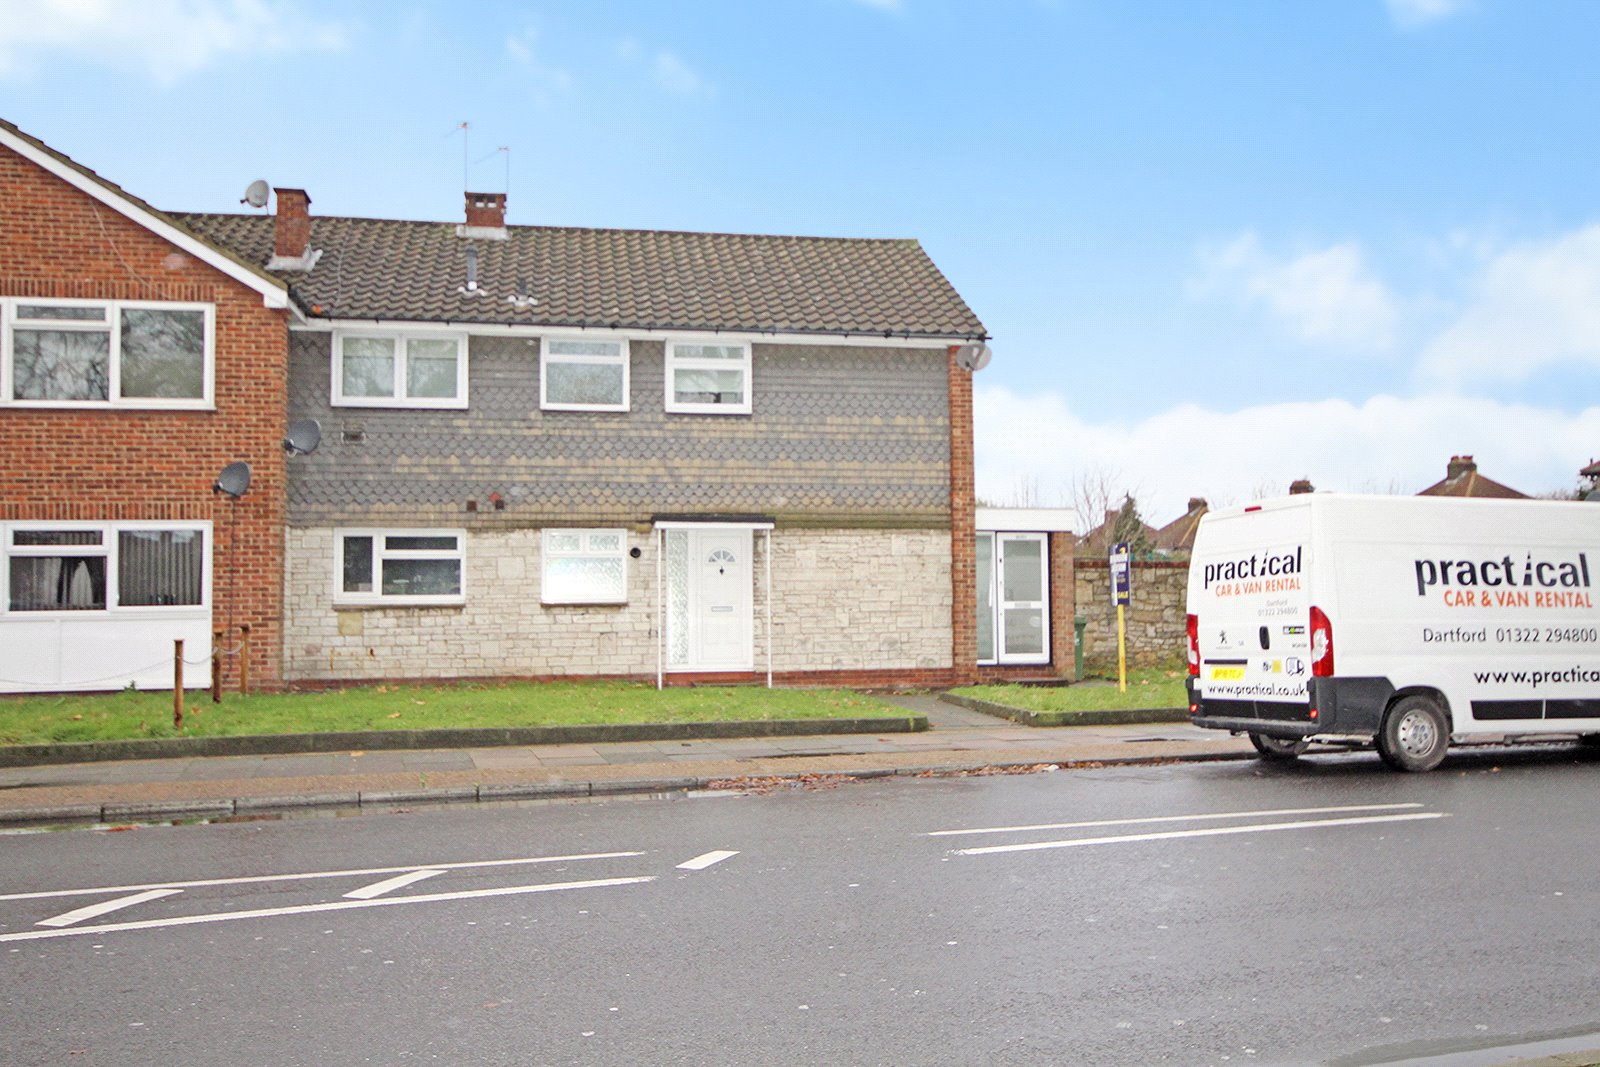 Bellegrove Road, Welling, Kent, DA16